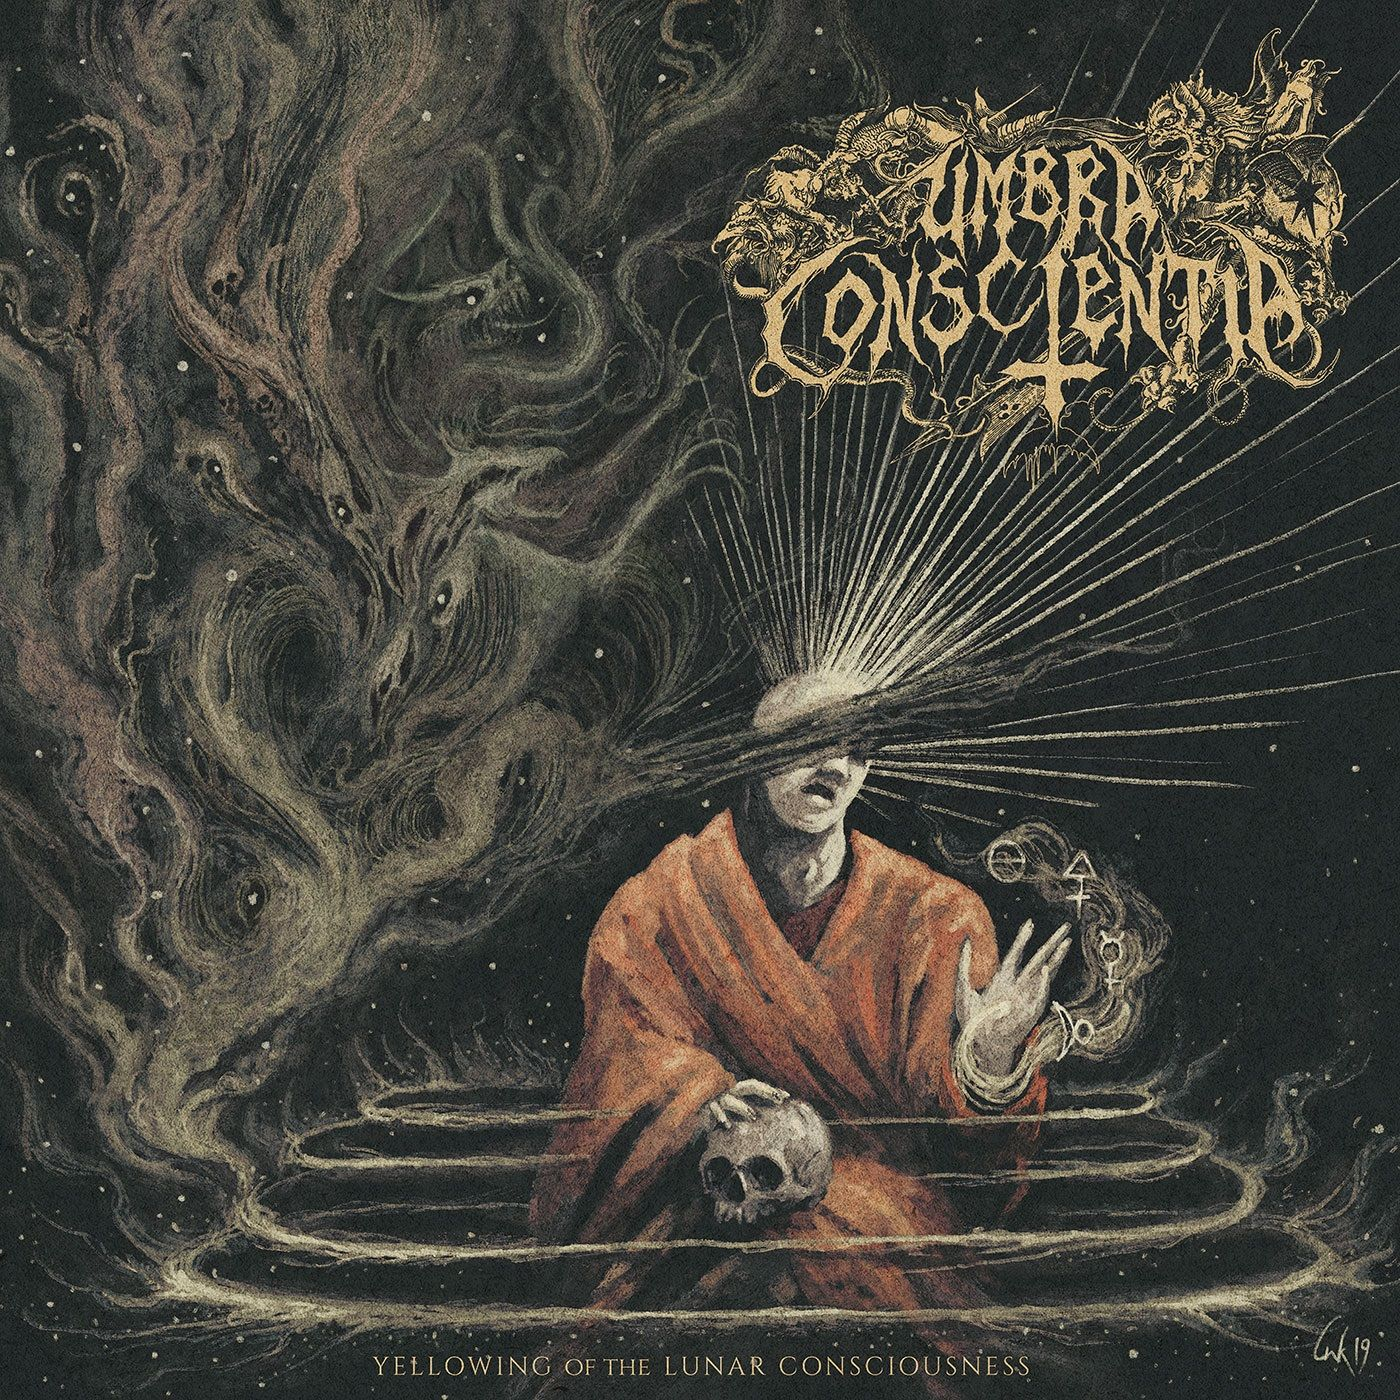 Umbra Conscientia - Yellowing of the Lunar Consciousness